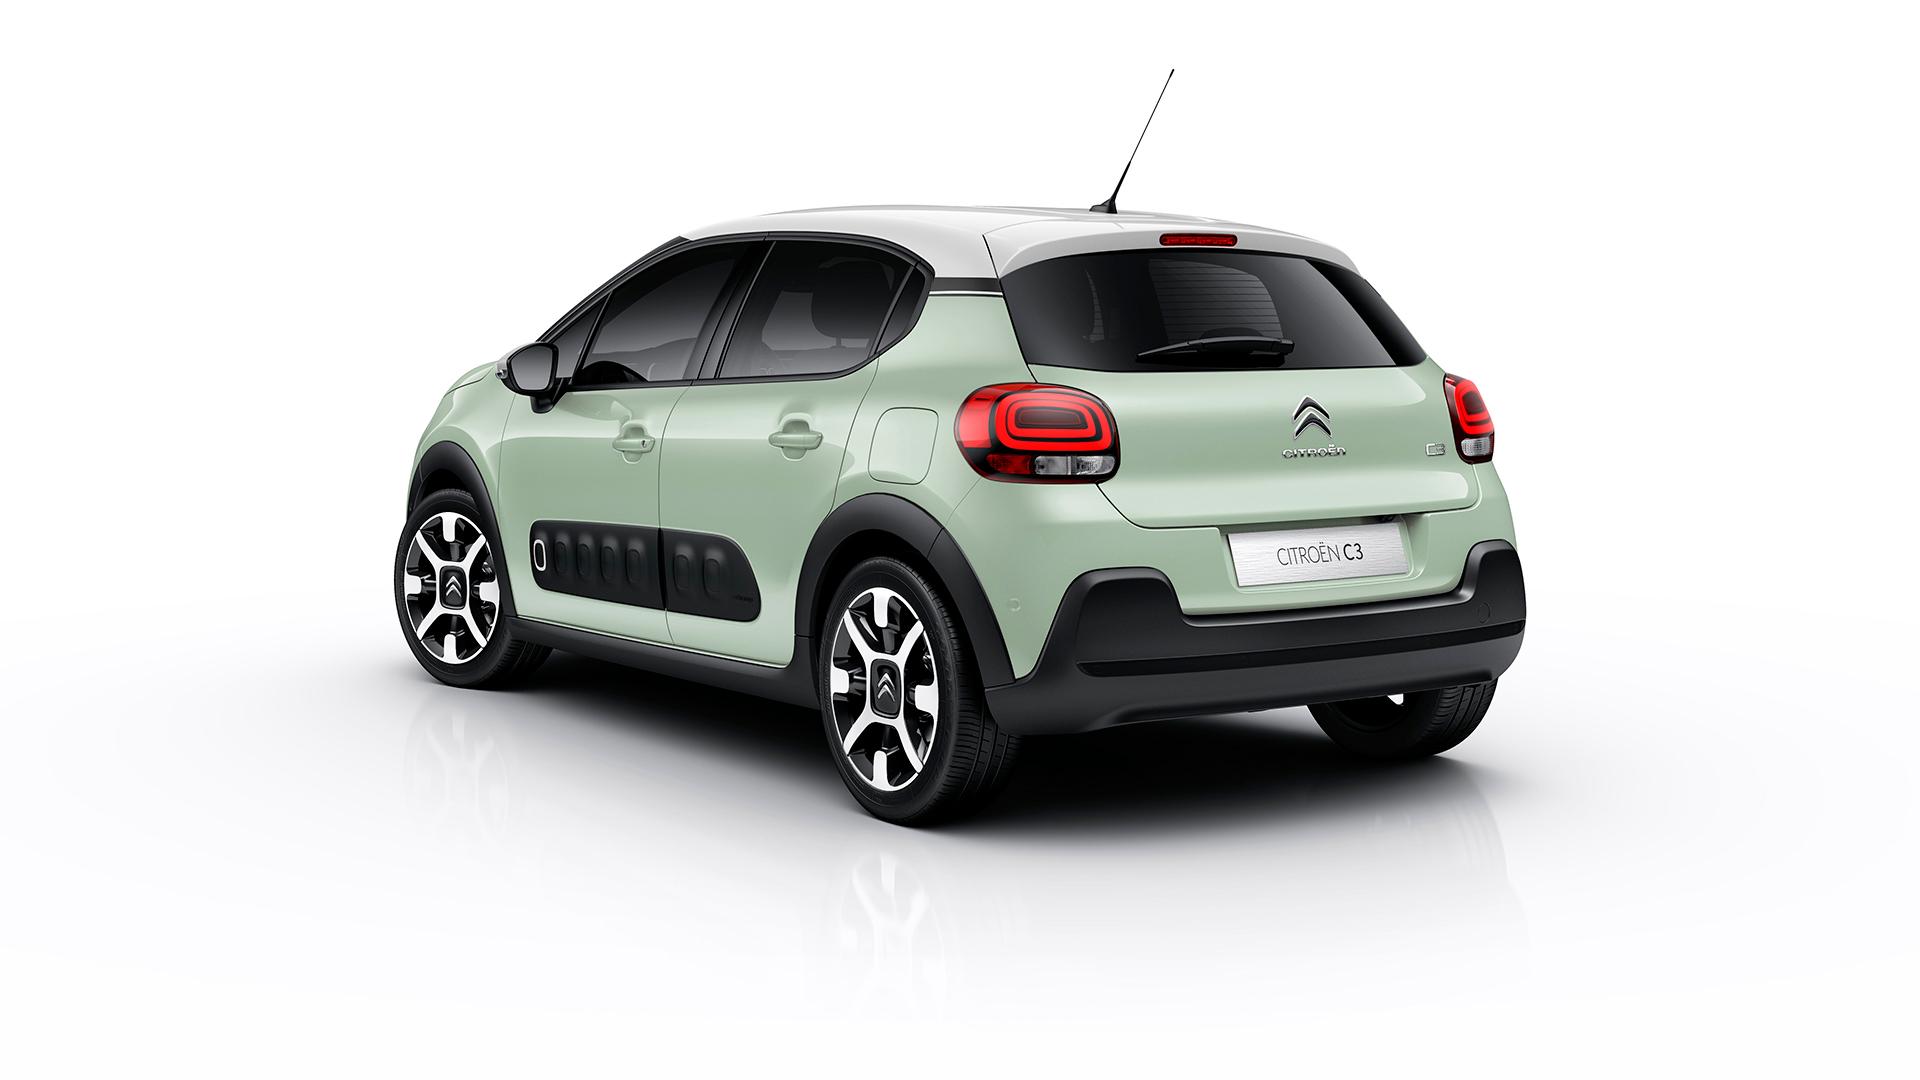 Citroen reveals new C3 supermini | Auto Trader UK